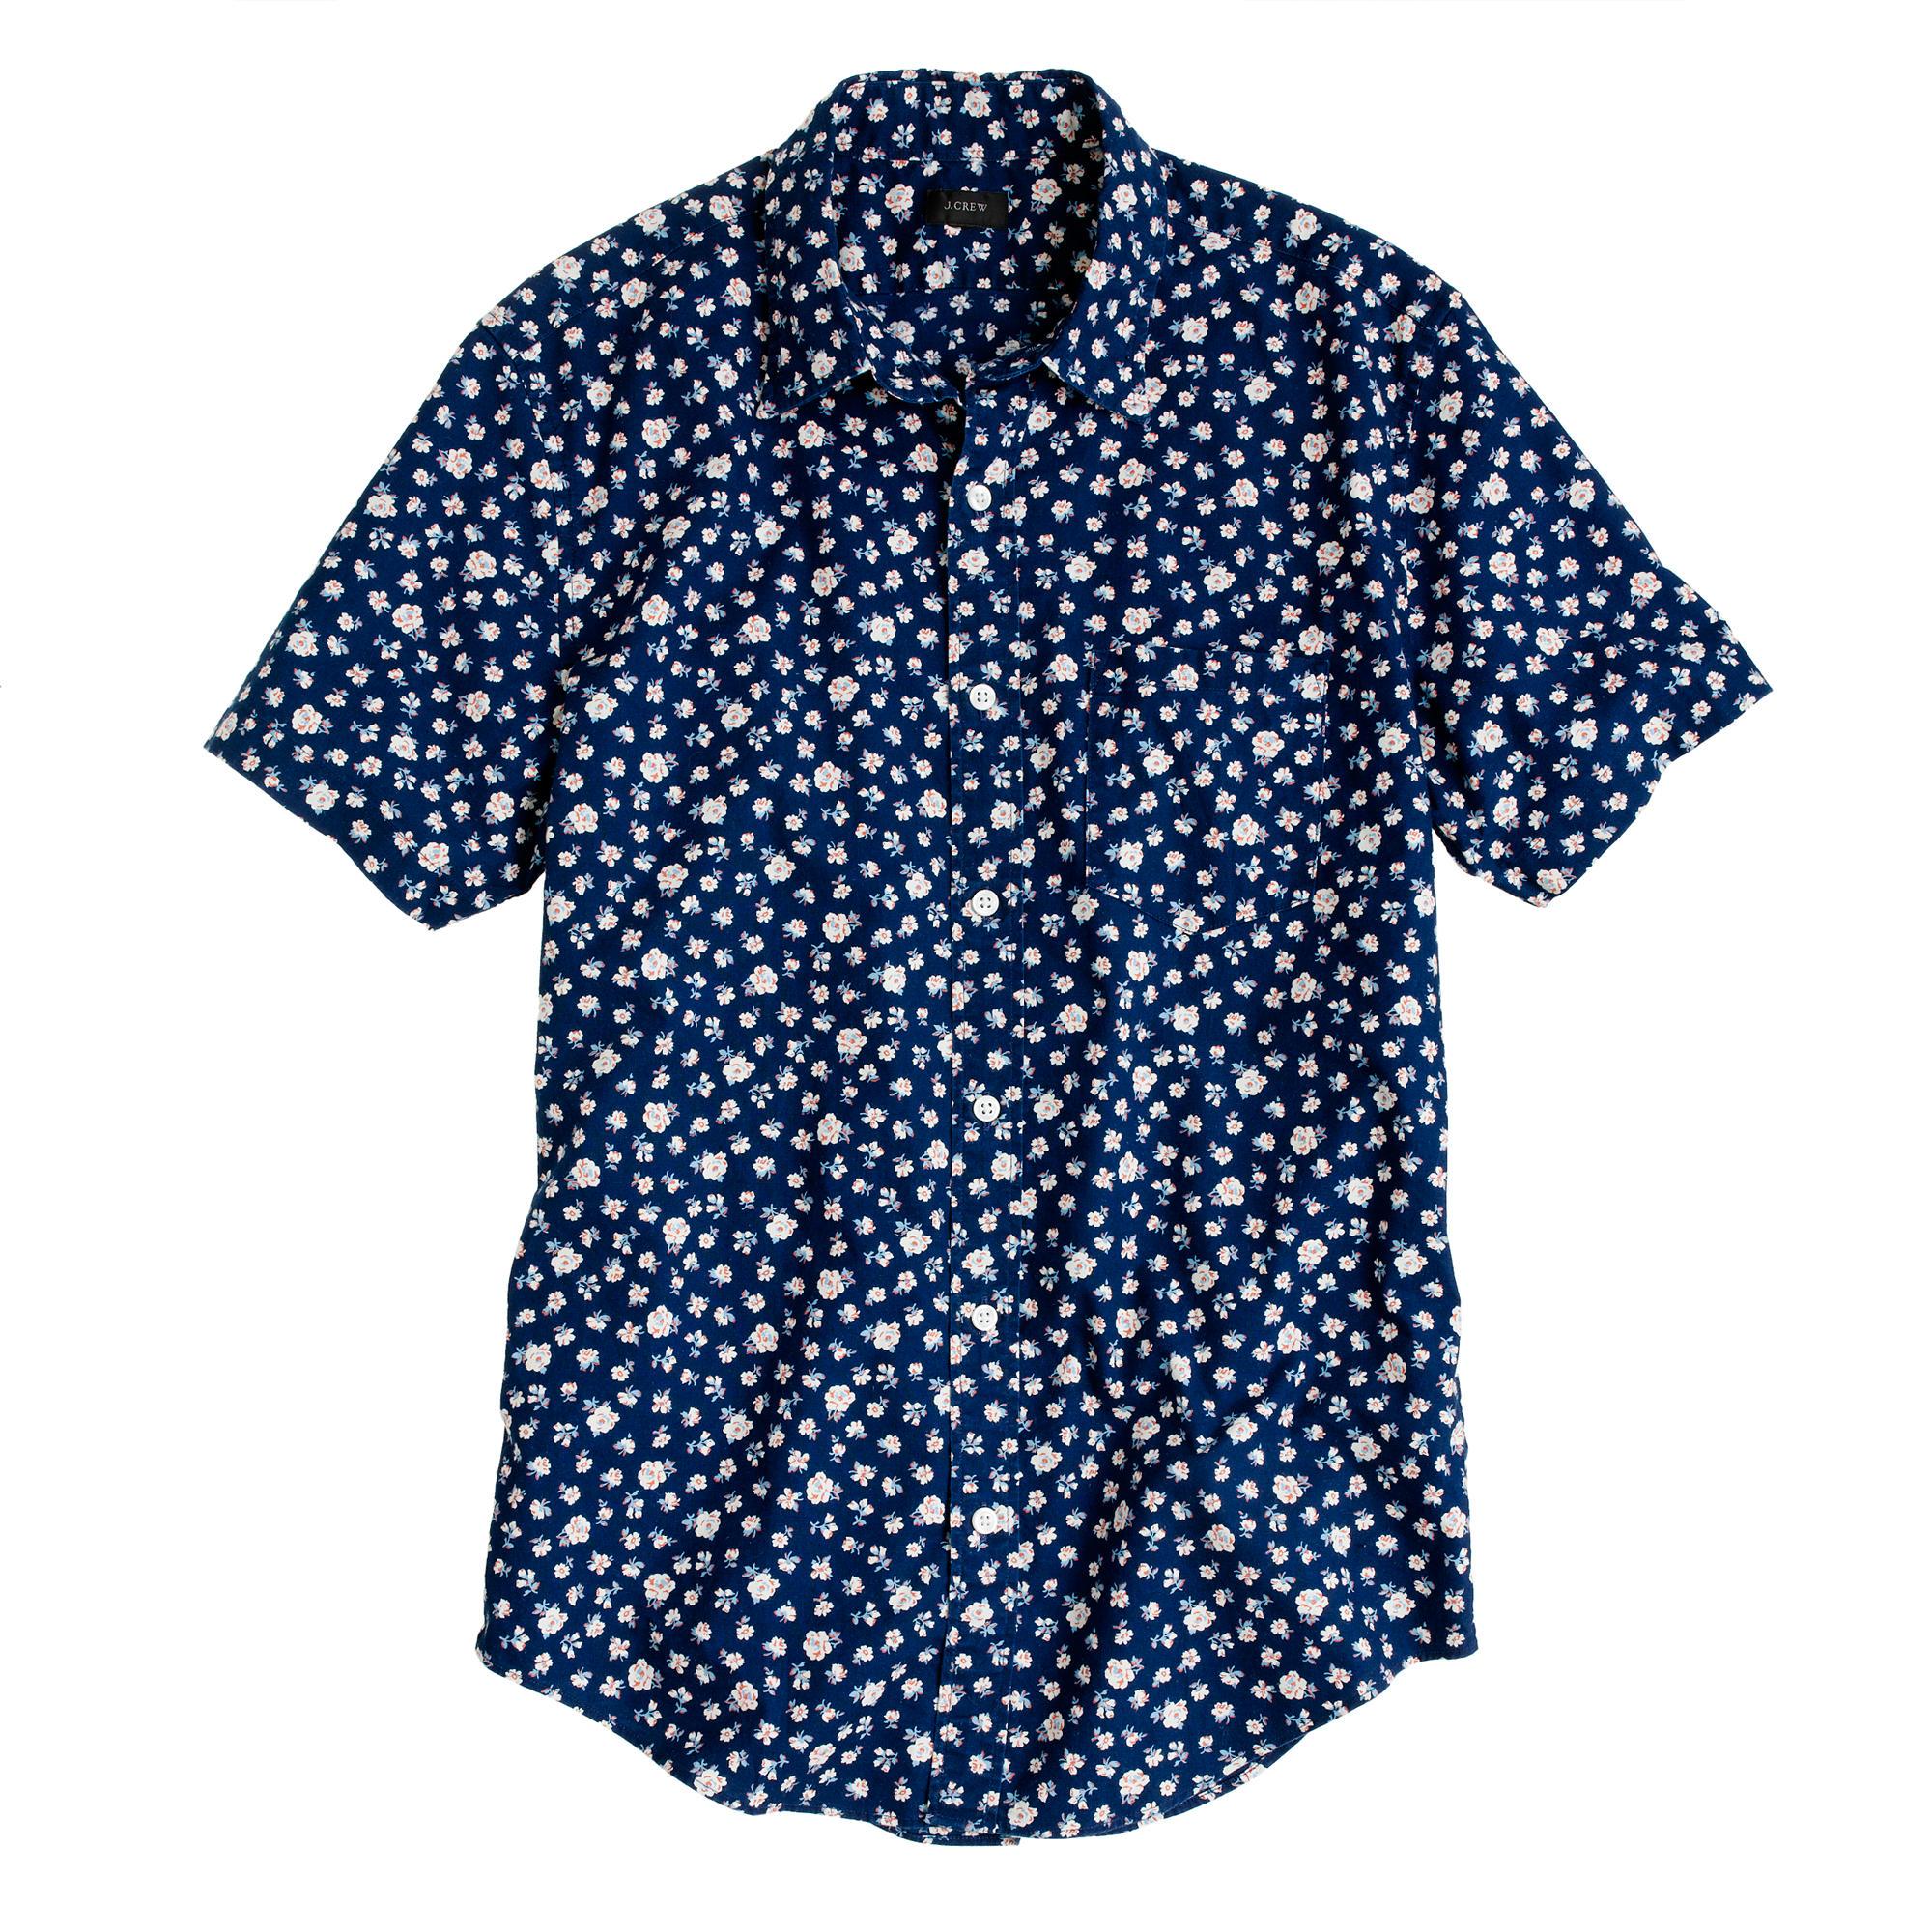 Indigo short sleeve shirt in floral reverse print j crew for Mens short sleeve floral shirt